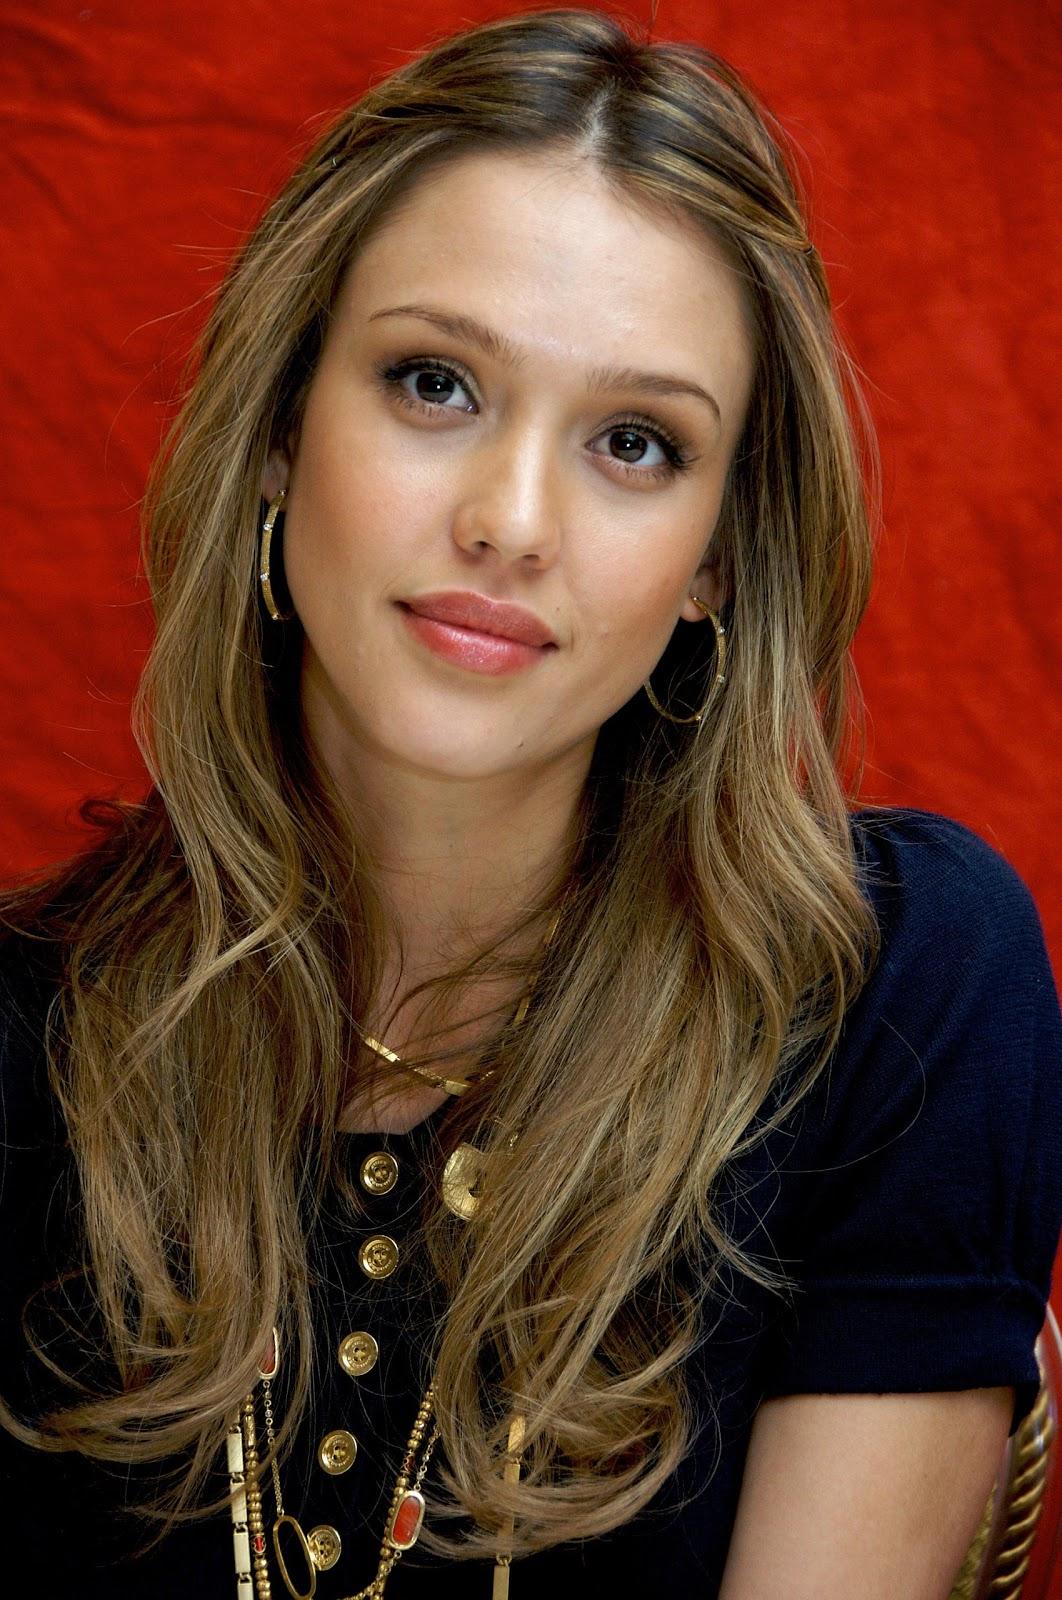 Wallpaper Actress And Actor: Jessica Marie Alba Wallpaper ...